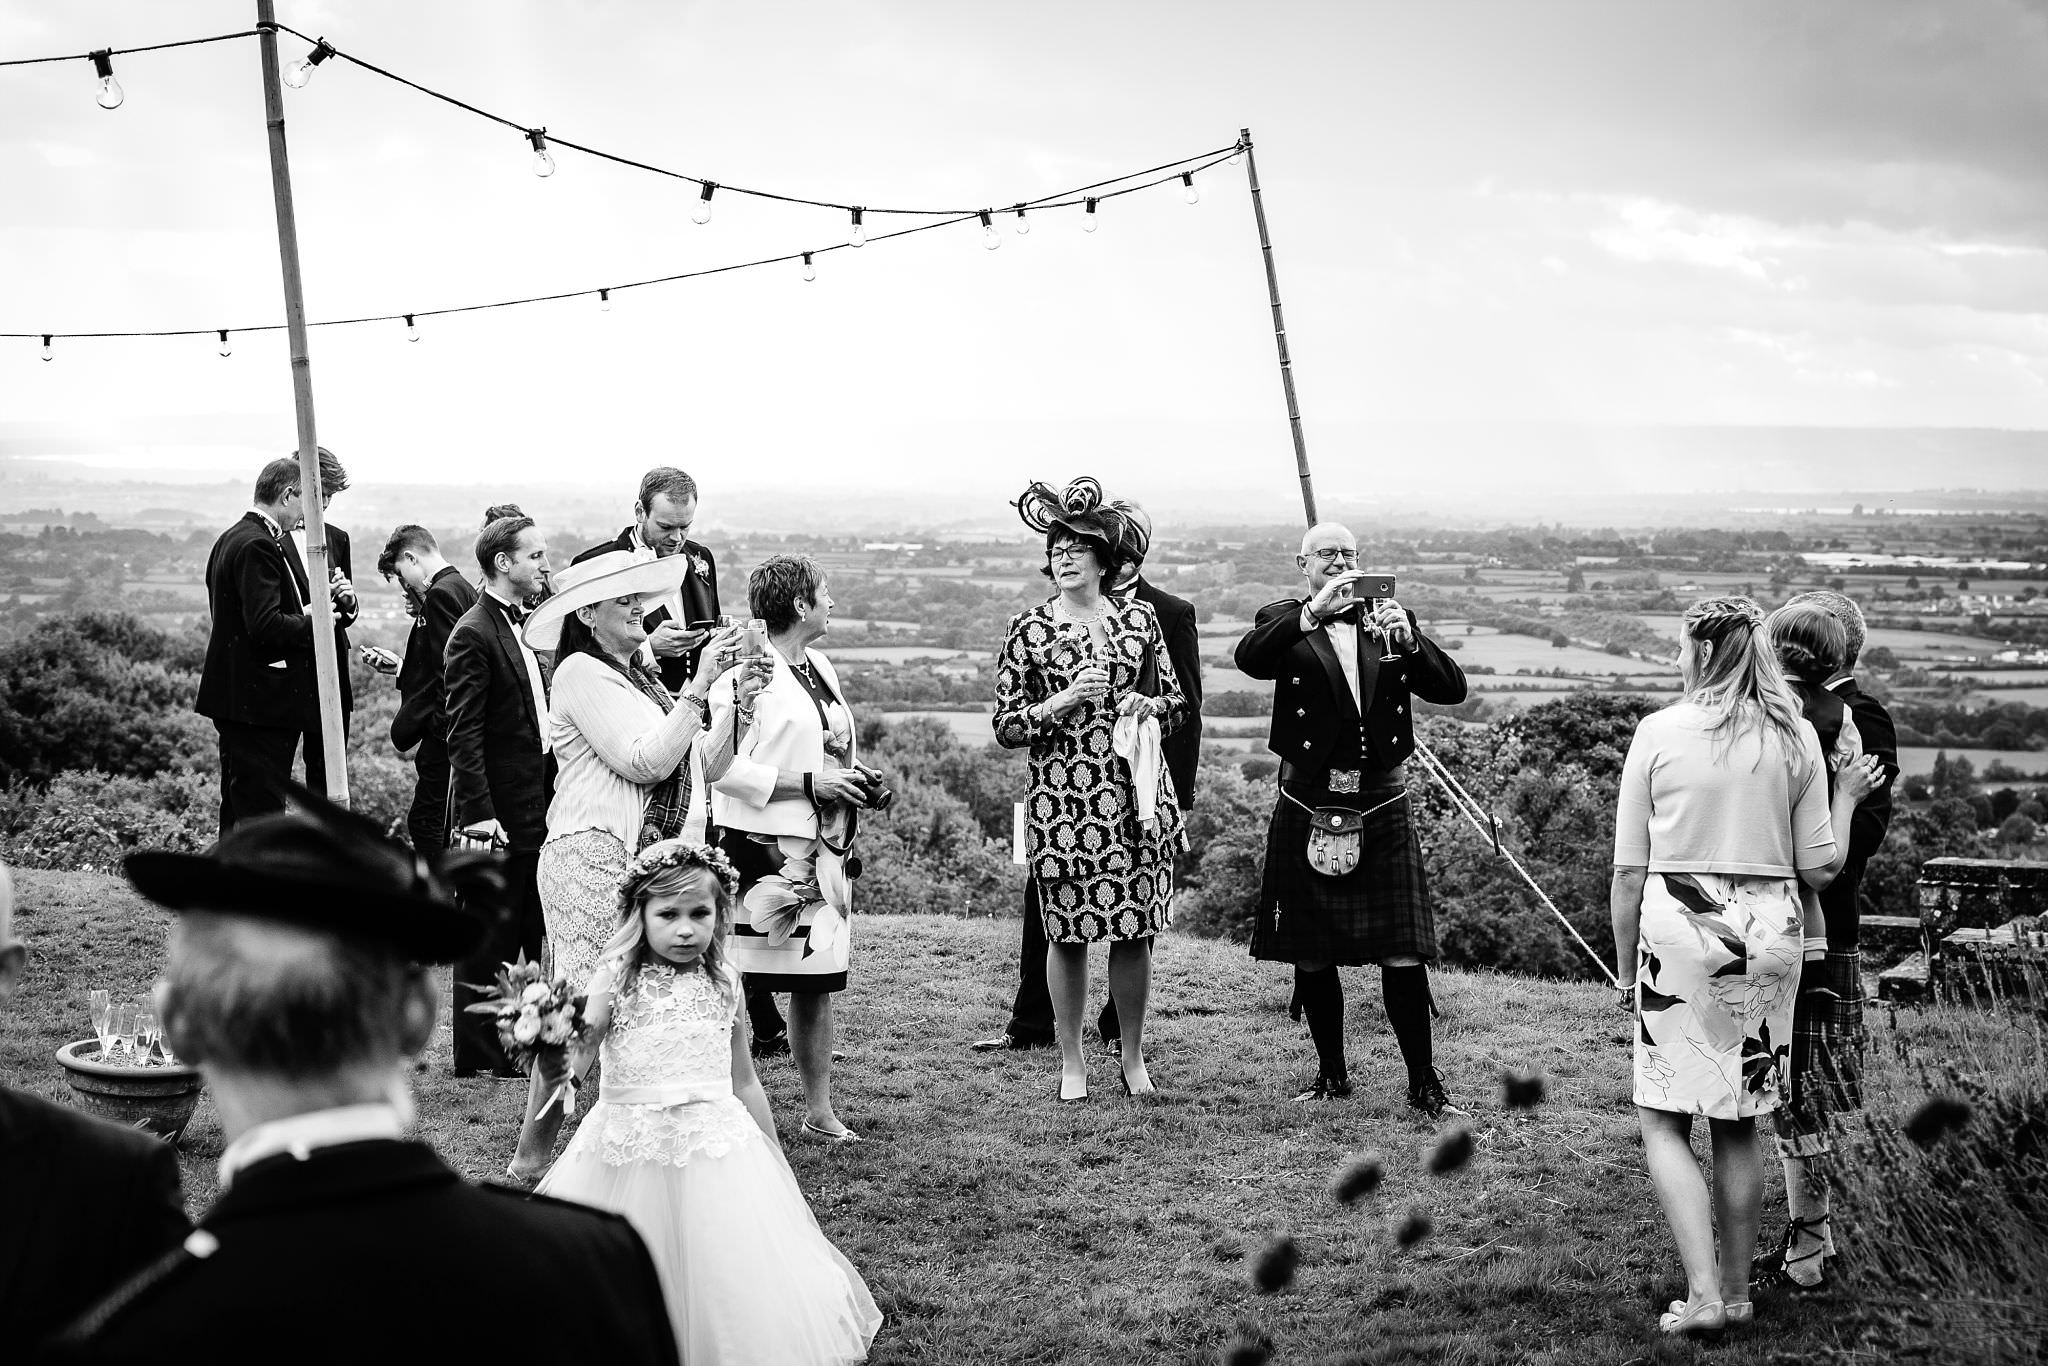 documentary wedding photography in gloucester